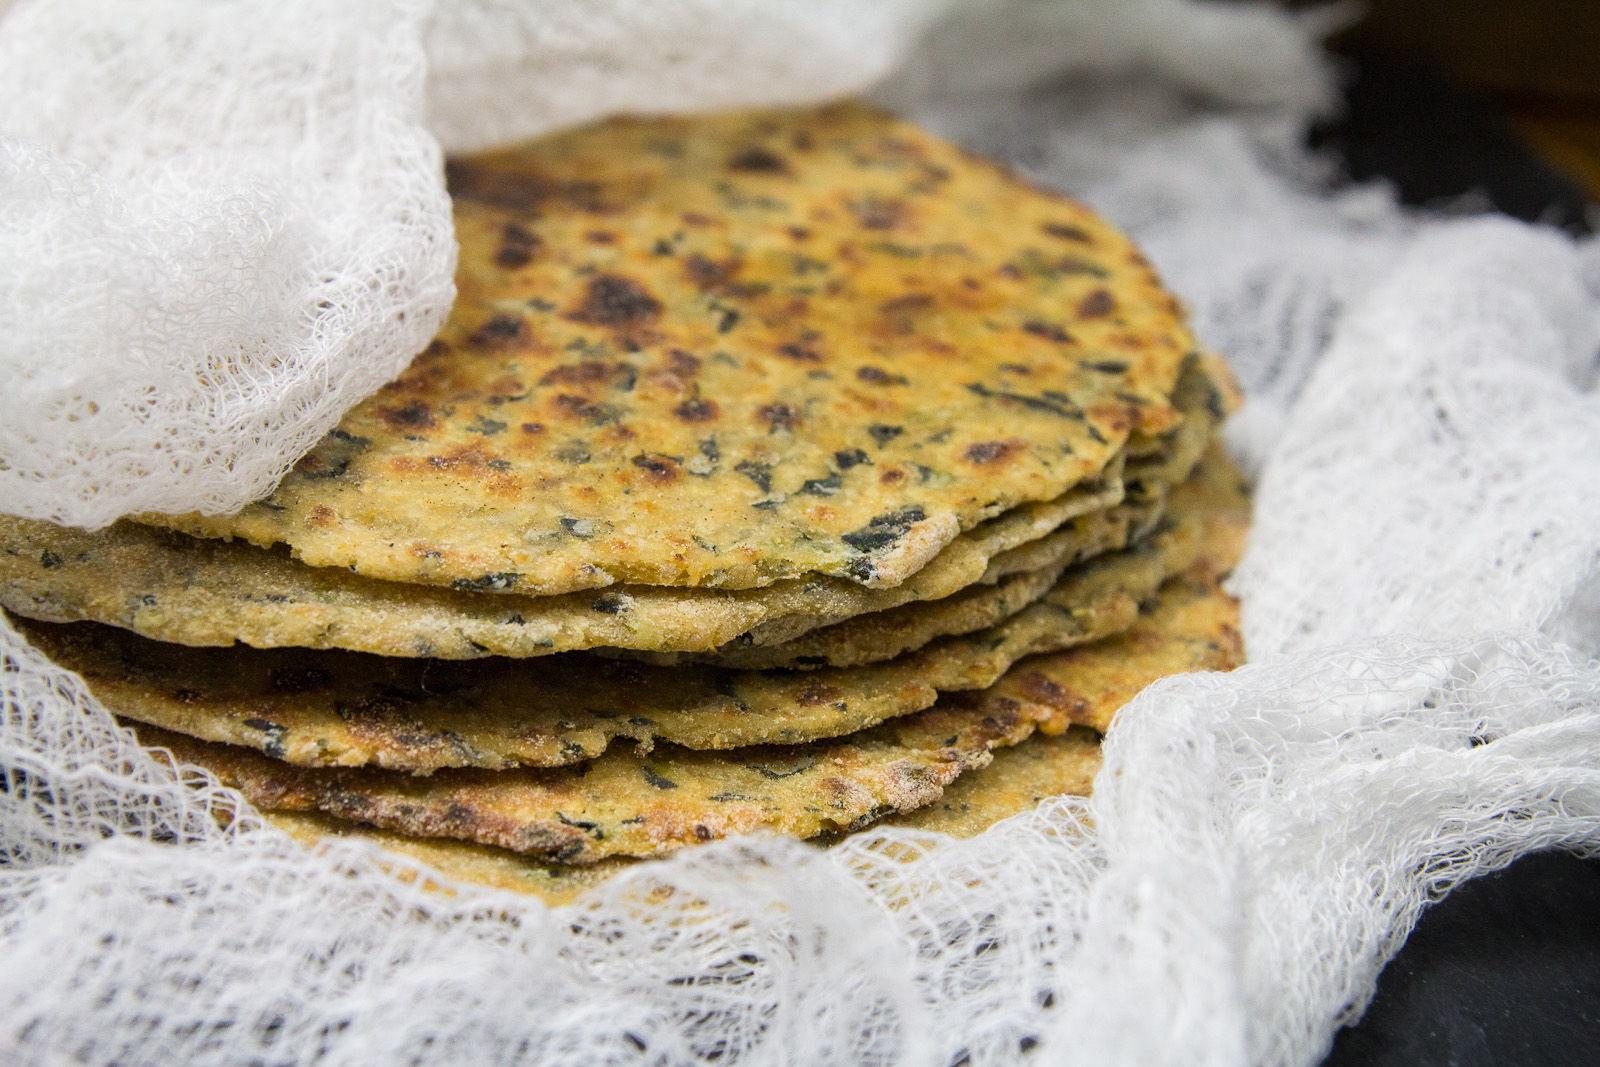 Kale quinoa paratha indiaphile kale quinoa paratha recipe by indiaphilefo forumfinder Image collections